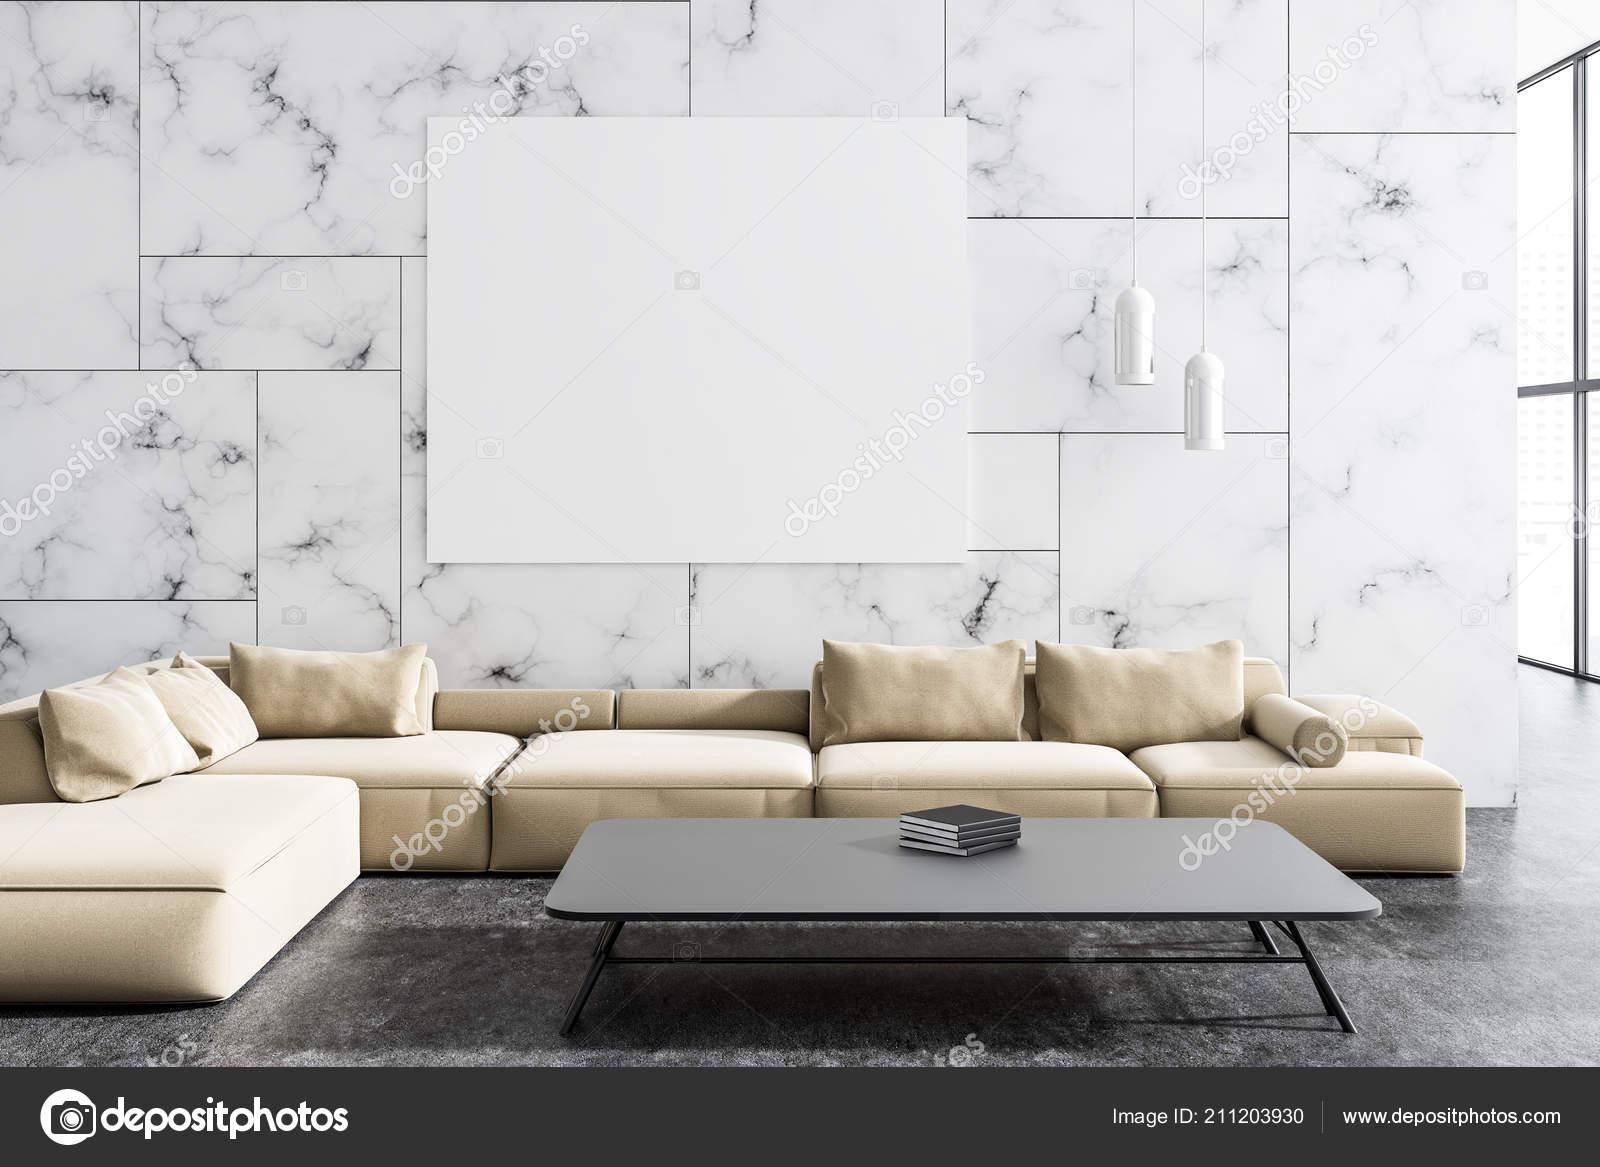 Modern Living Room Interior White Marble Walls Concrete Floor Beige